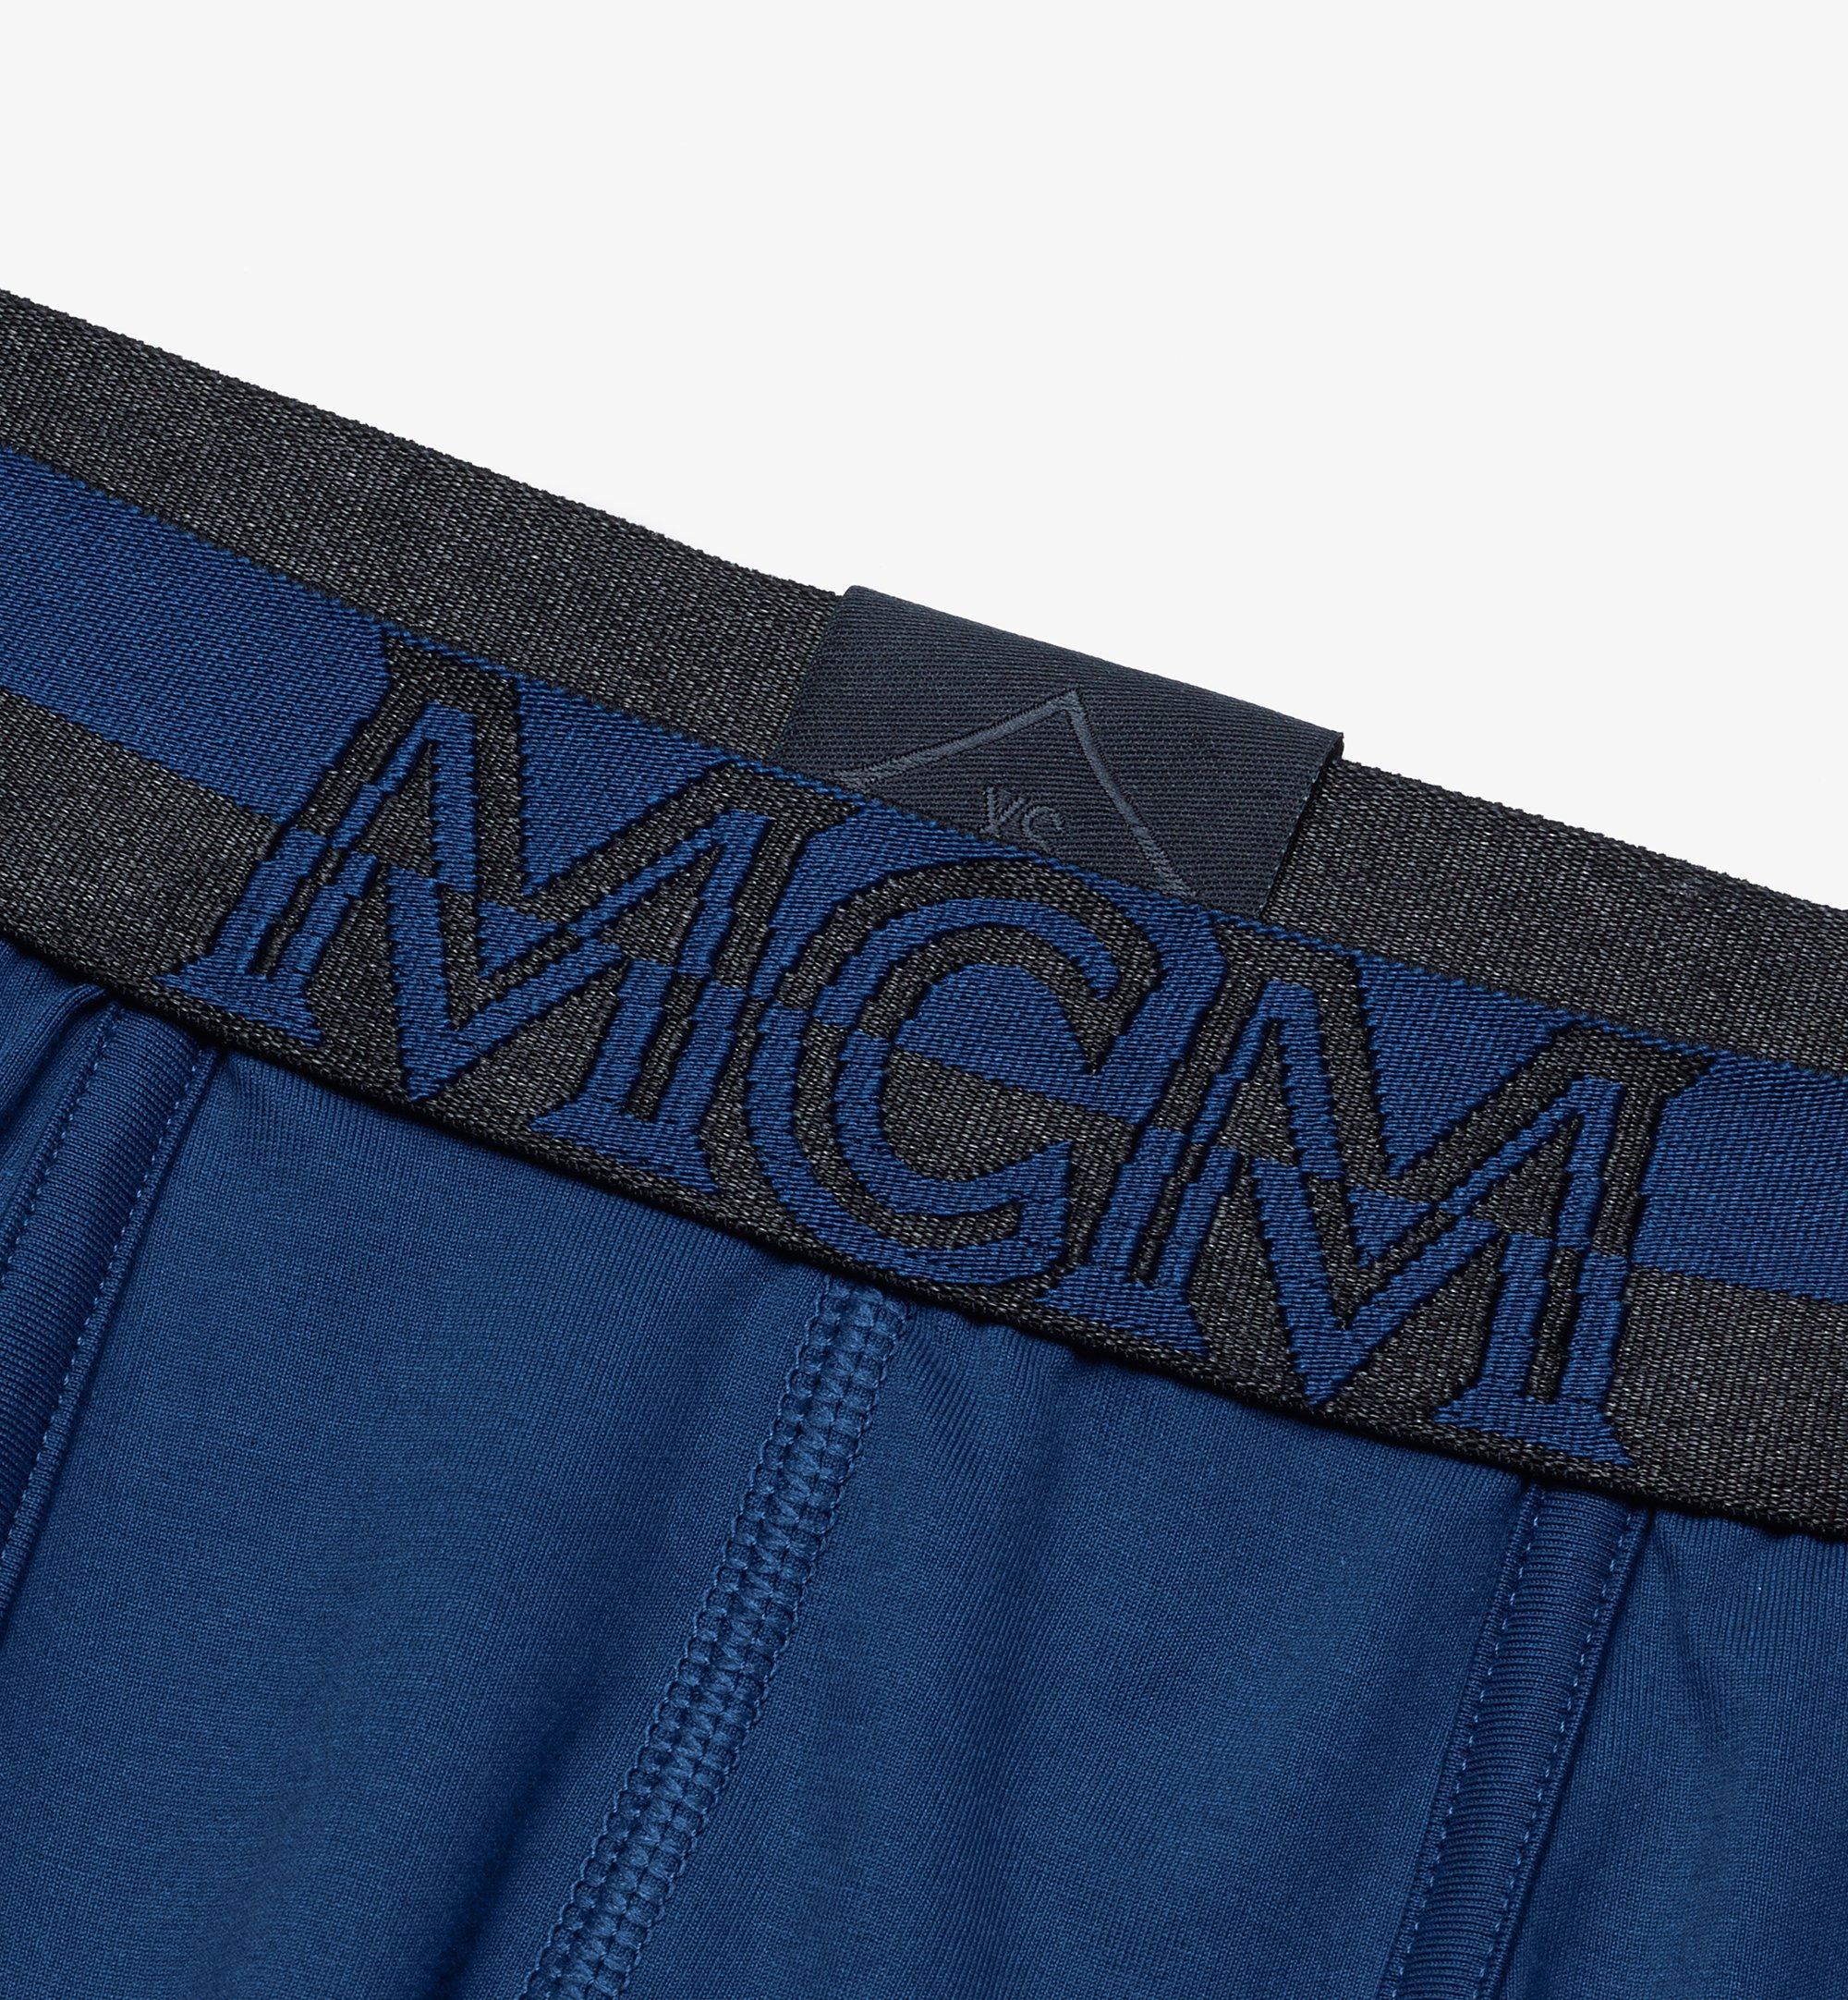 MCM 男士 1976 短款緊身四角褲 Blue MHYASBM02LU00M 更多視圖 2